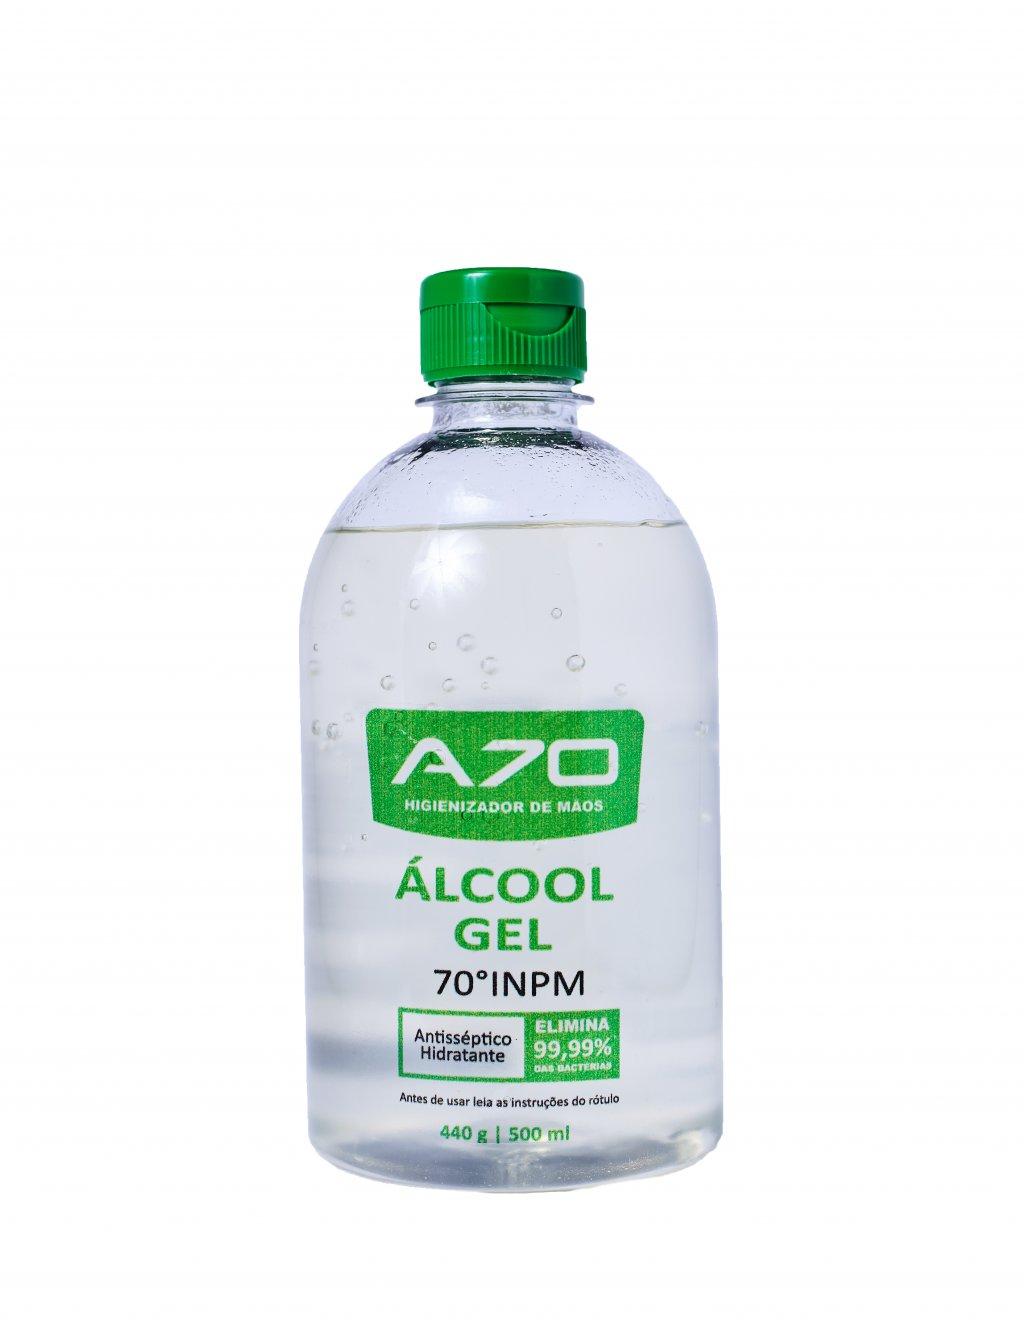 ALCOOL GEL 70% 500ML DE QUALIDADE TOP